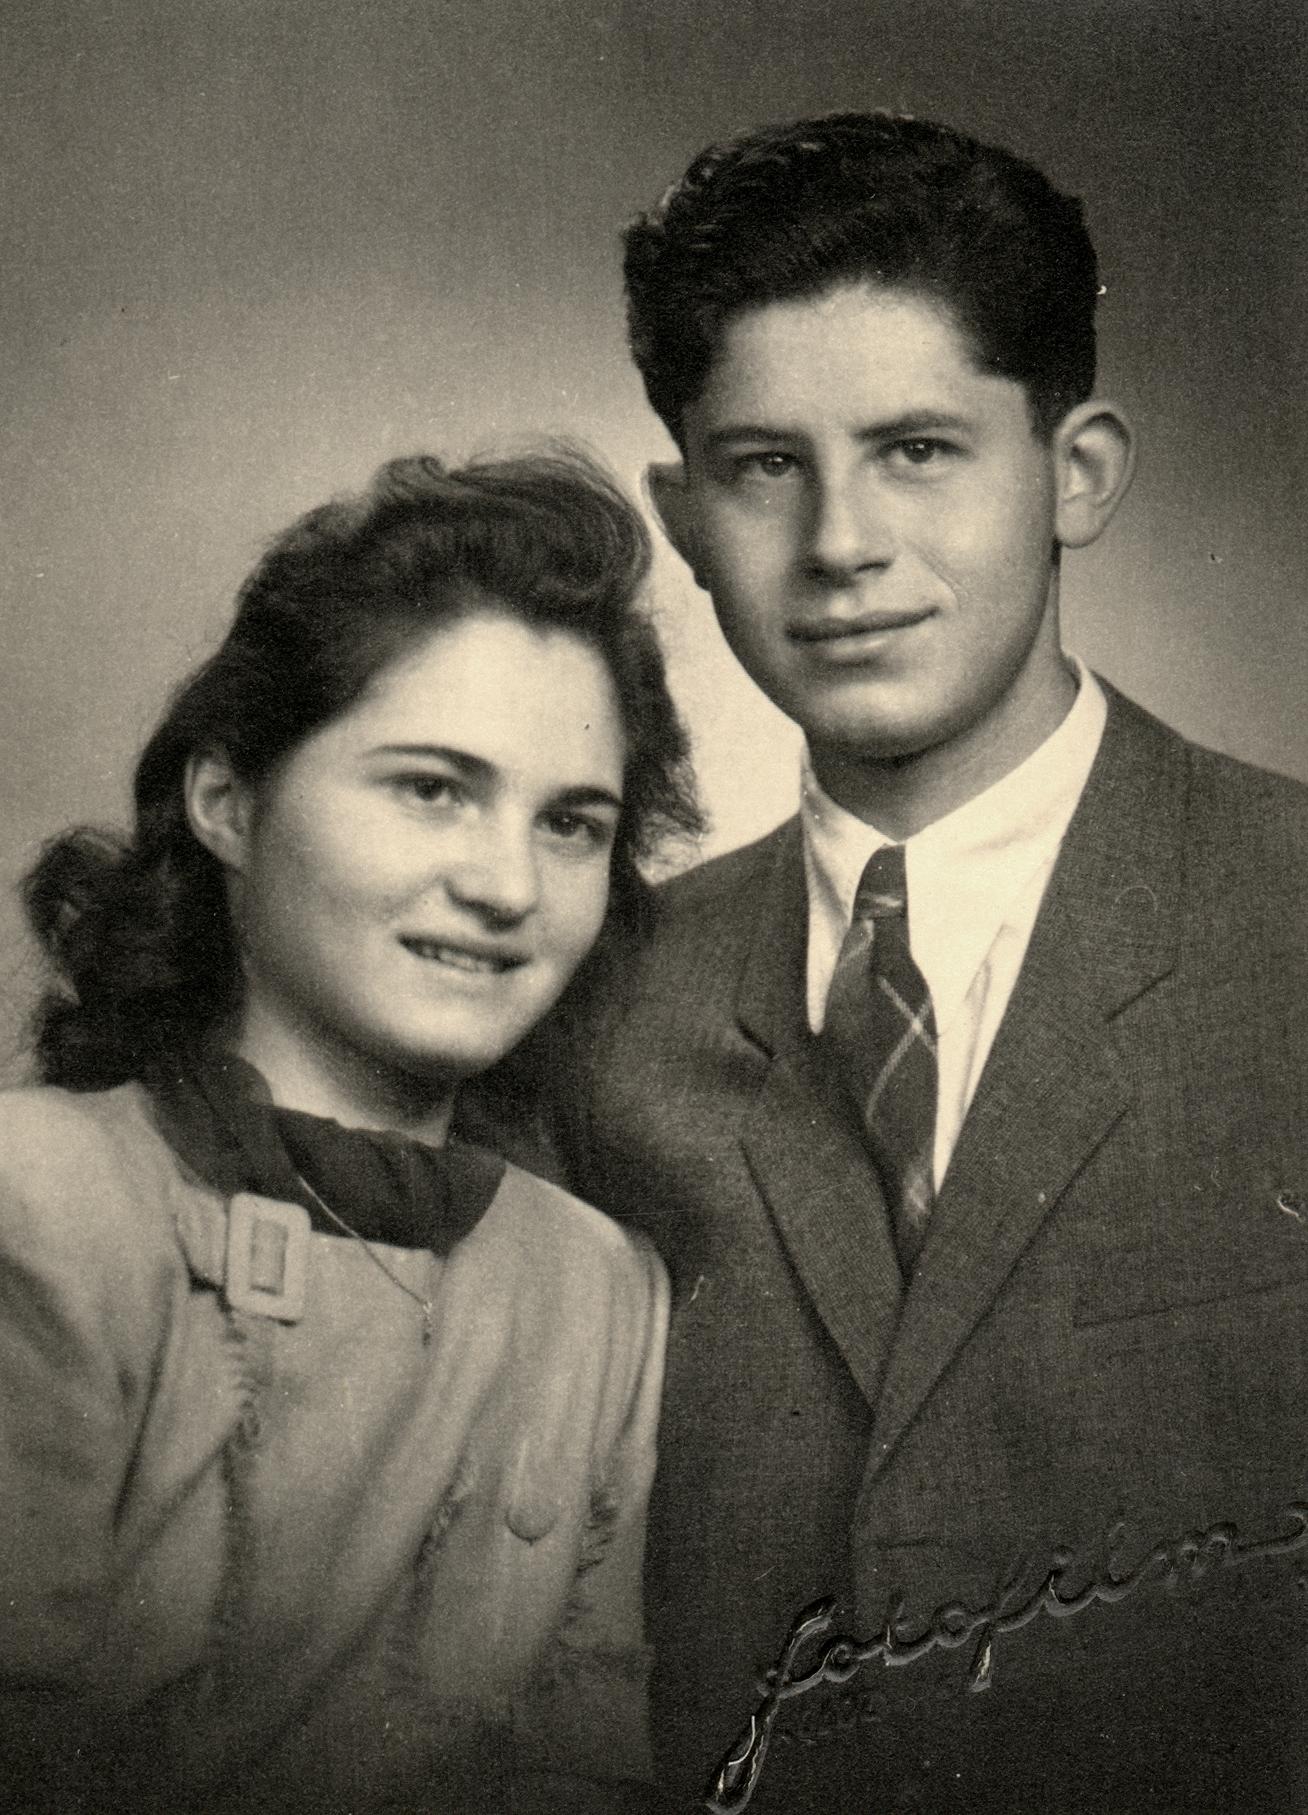 Laszlo Nussbaum and his future wife, Silvia Brull